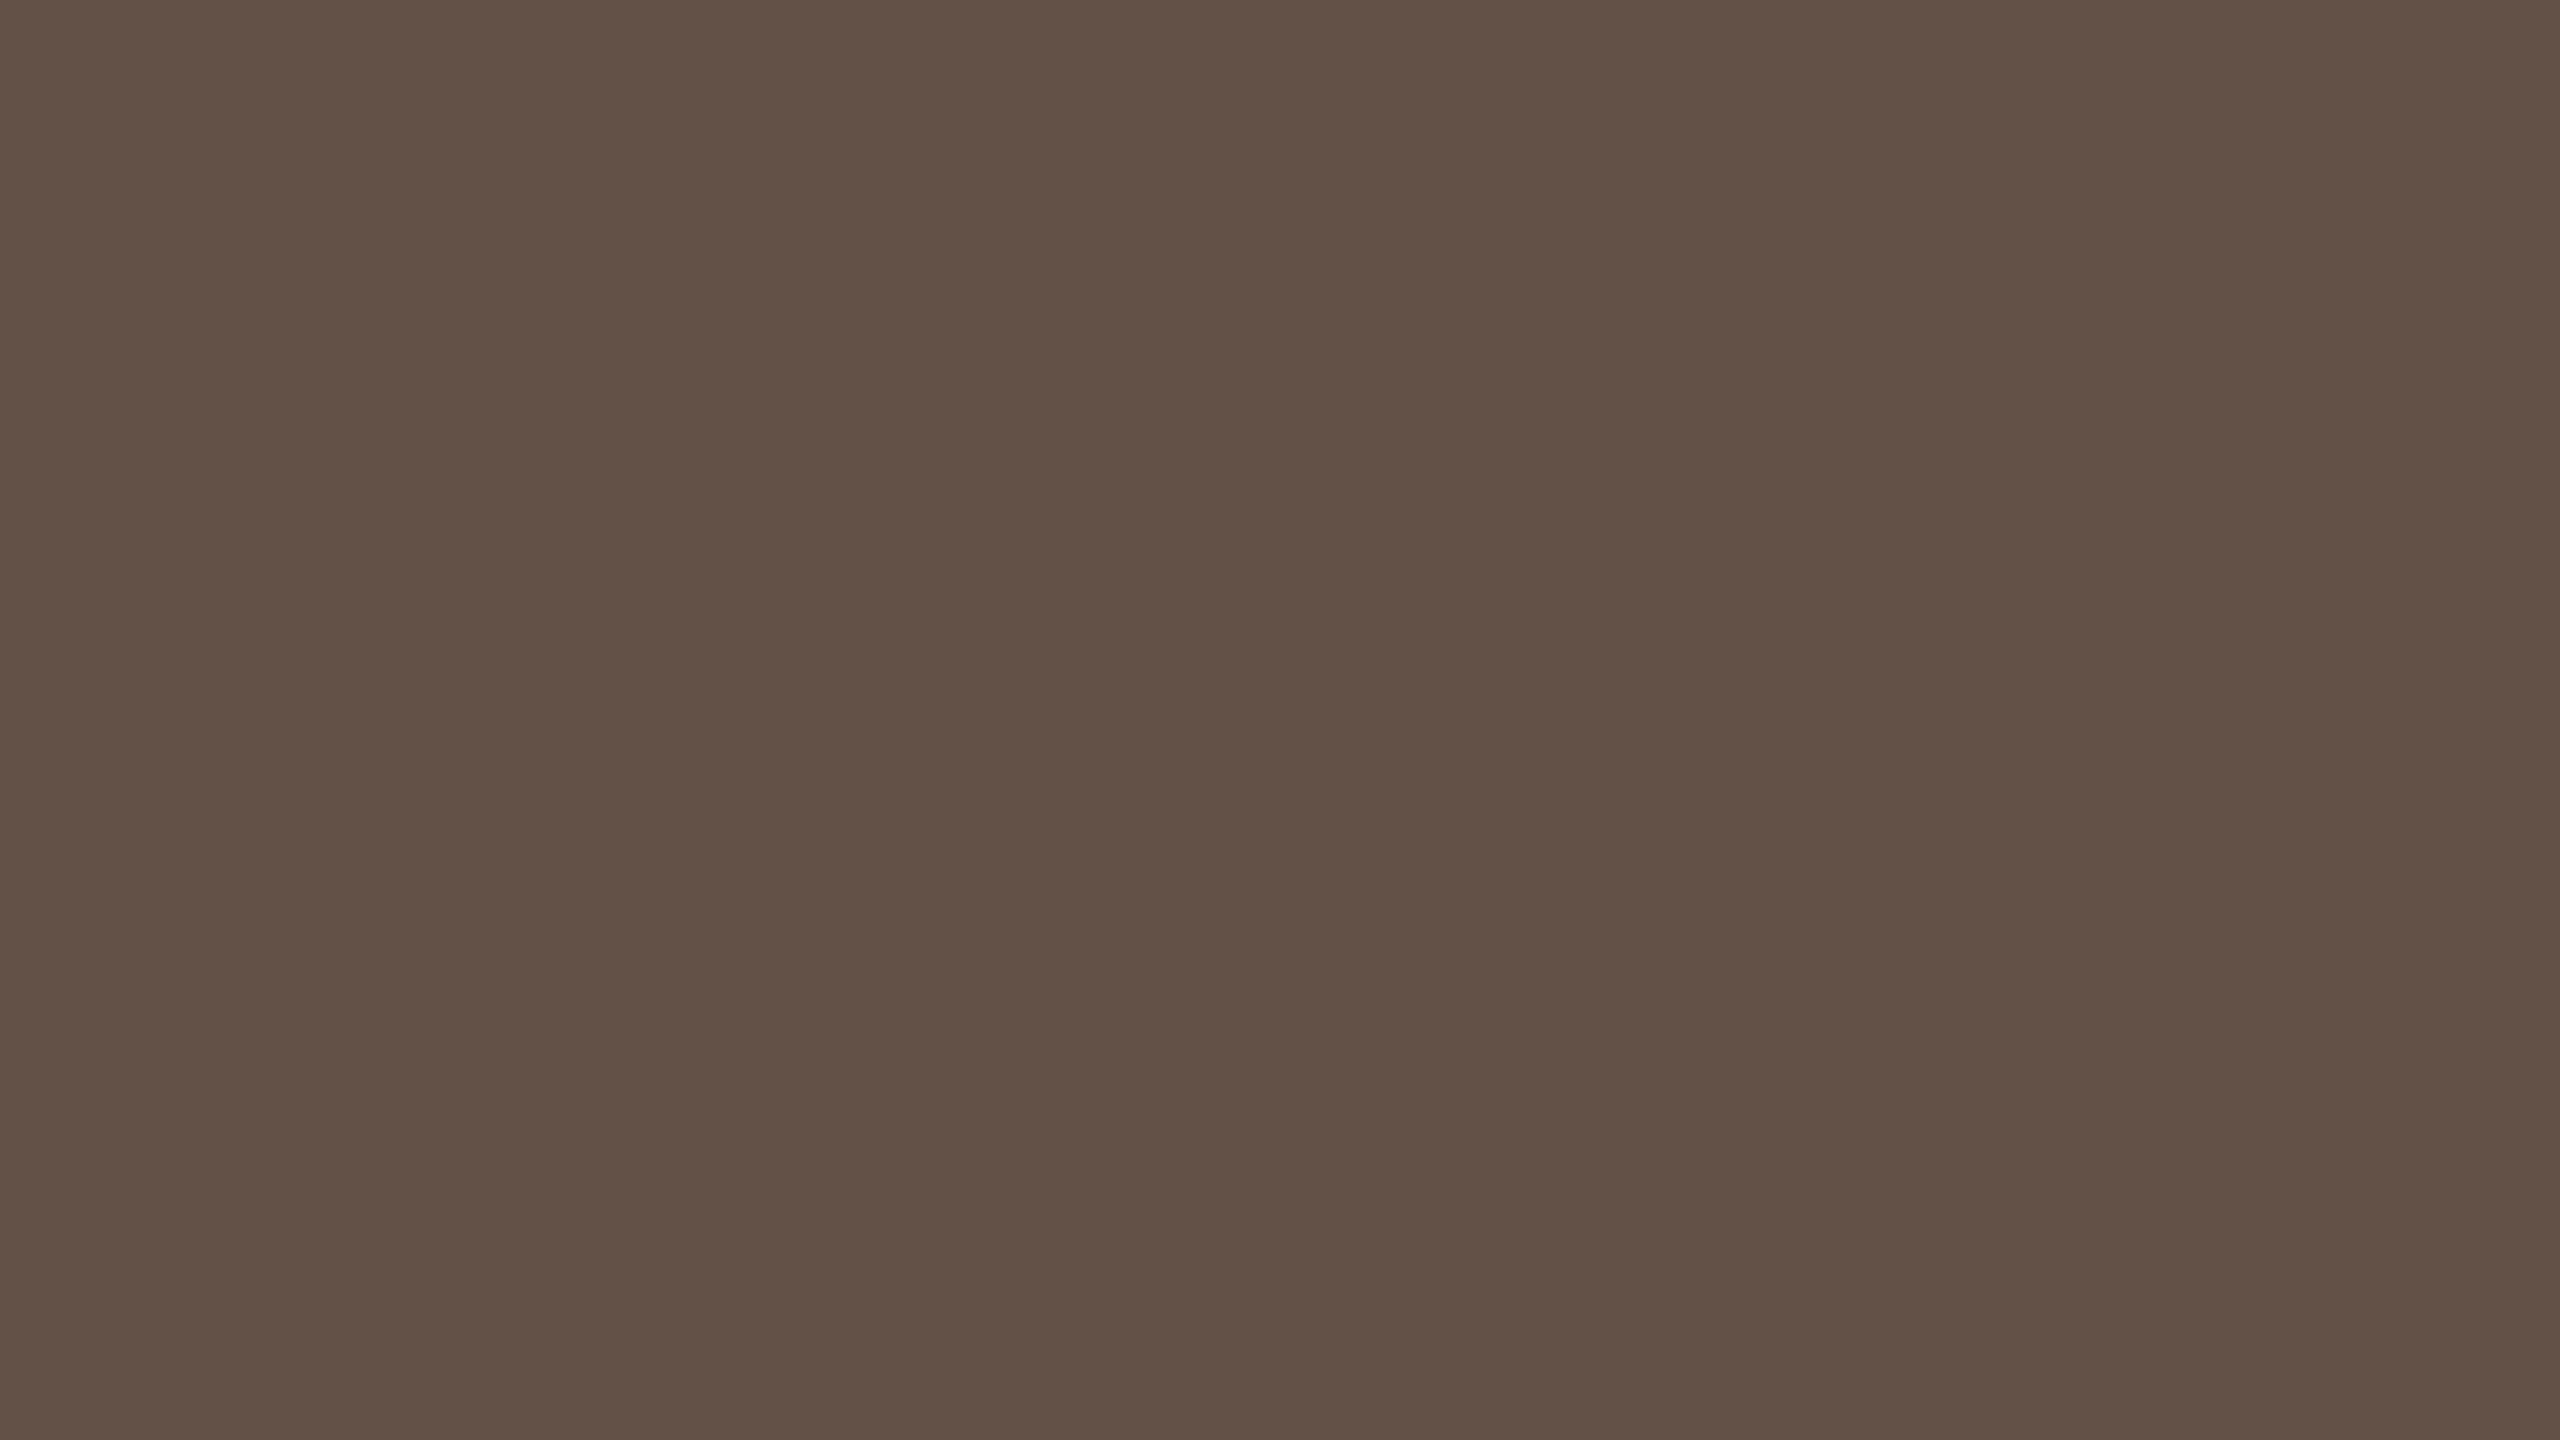 2560x1440 Umber Solid Color Background